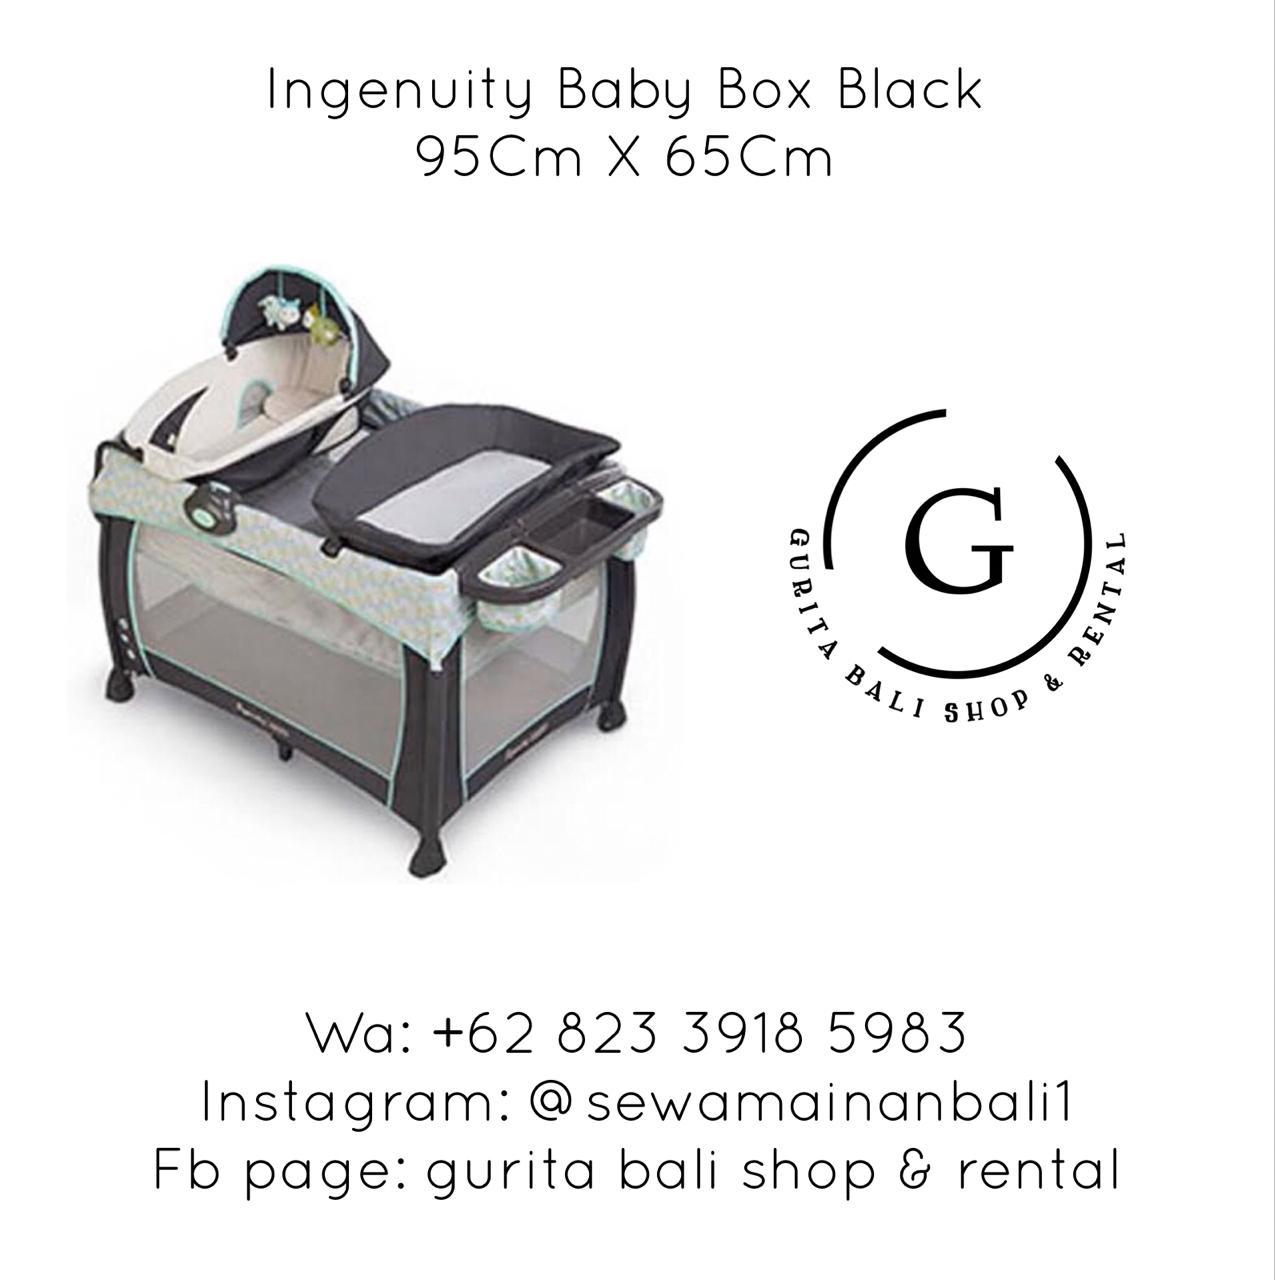 INGENUITY BABY BOX BLACK 2